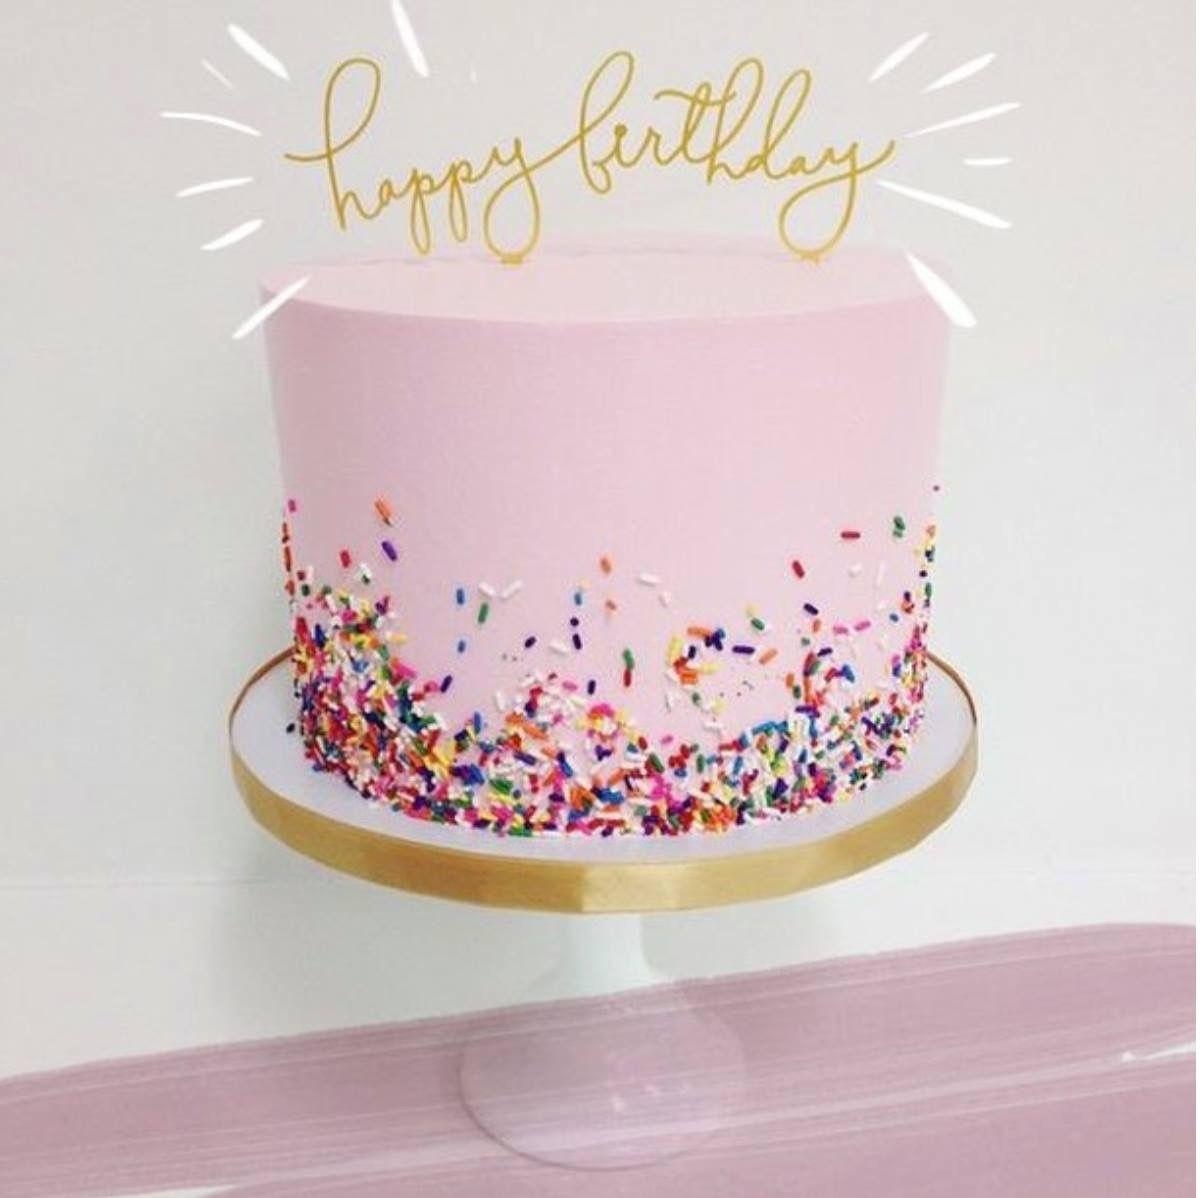 Pin by Andrea Maya on PARTTTYY TIME Pinterest Cake Birthdays